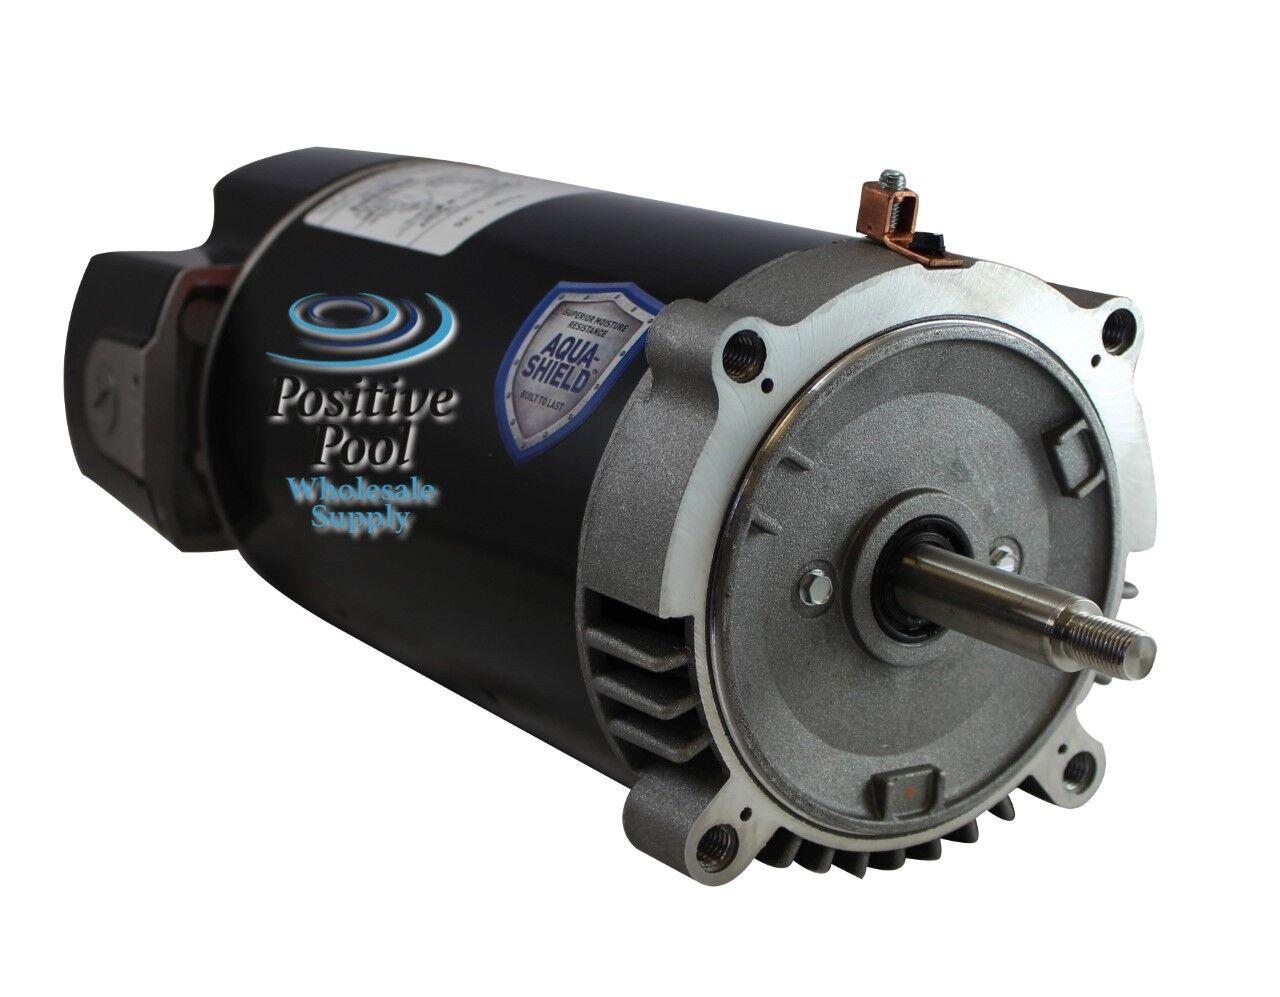 Emerson us motors ast165 1 5 hp pool pump motor hayward for Hayward pool pump motor